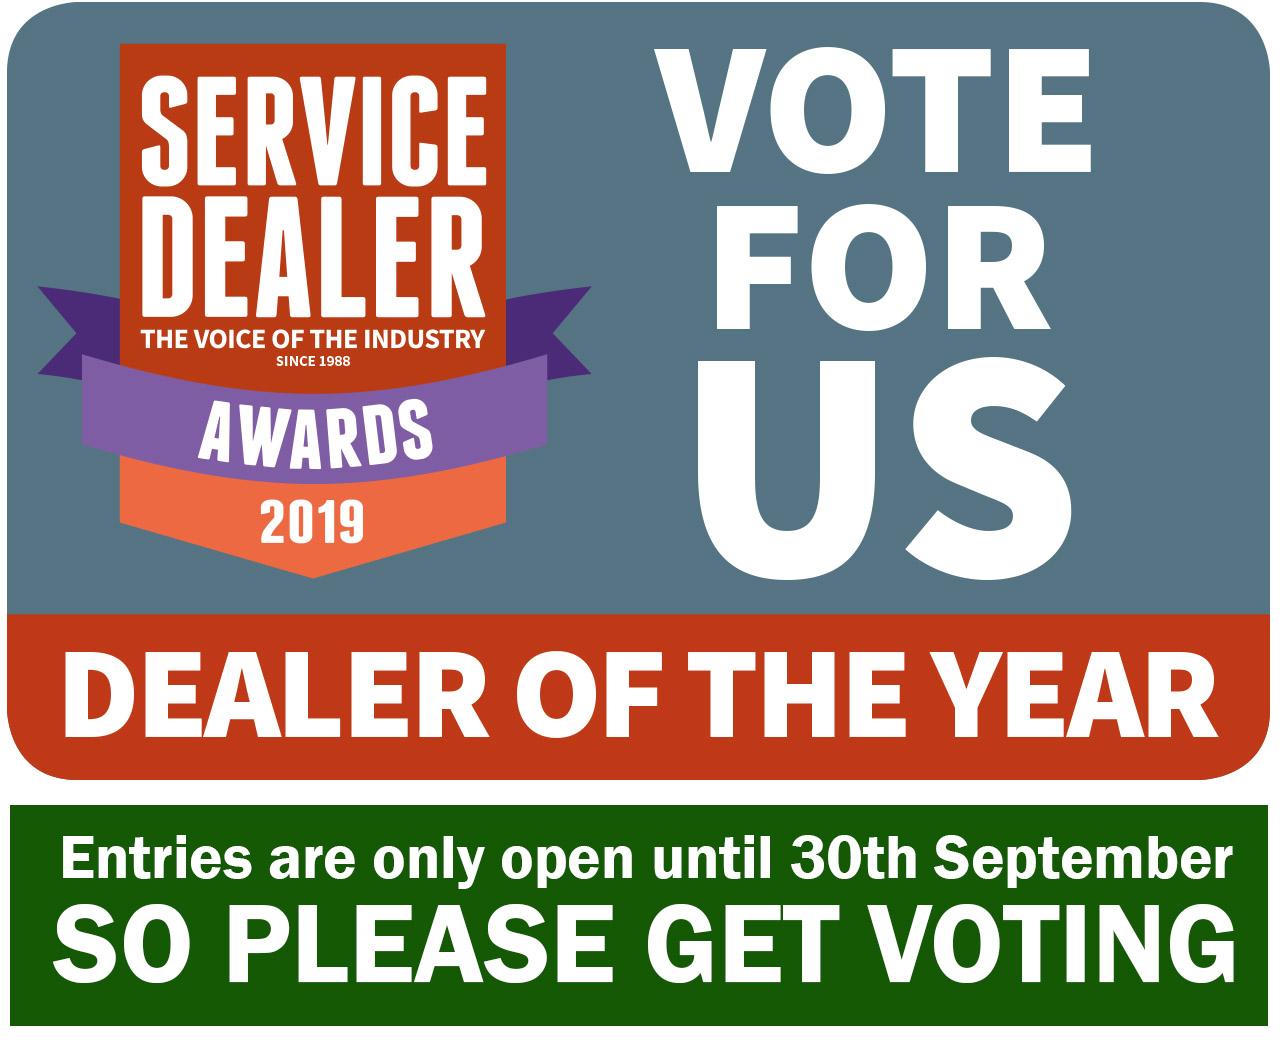 Vote for GGM in the 2019 Service Dealer Awards!!